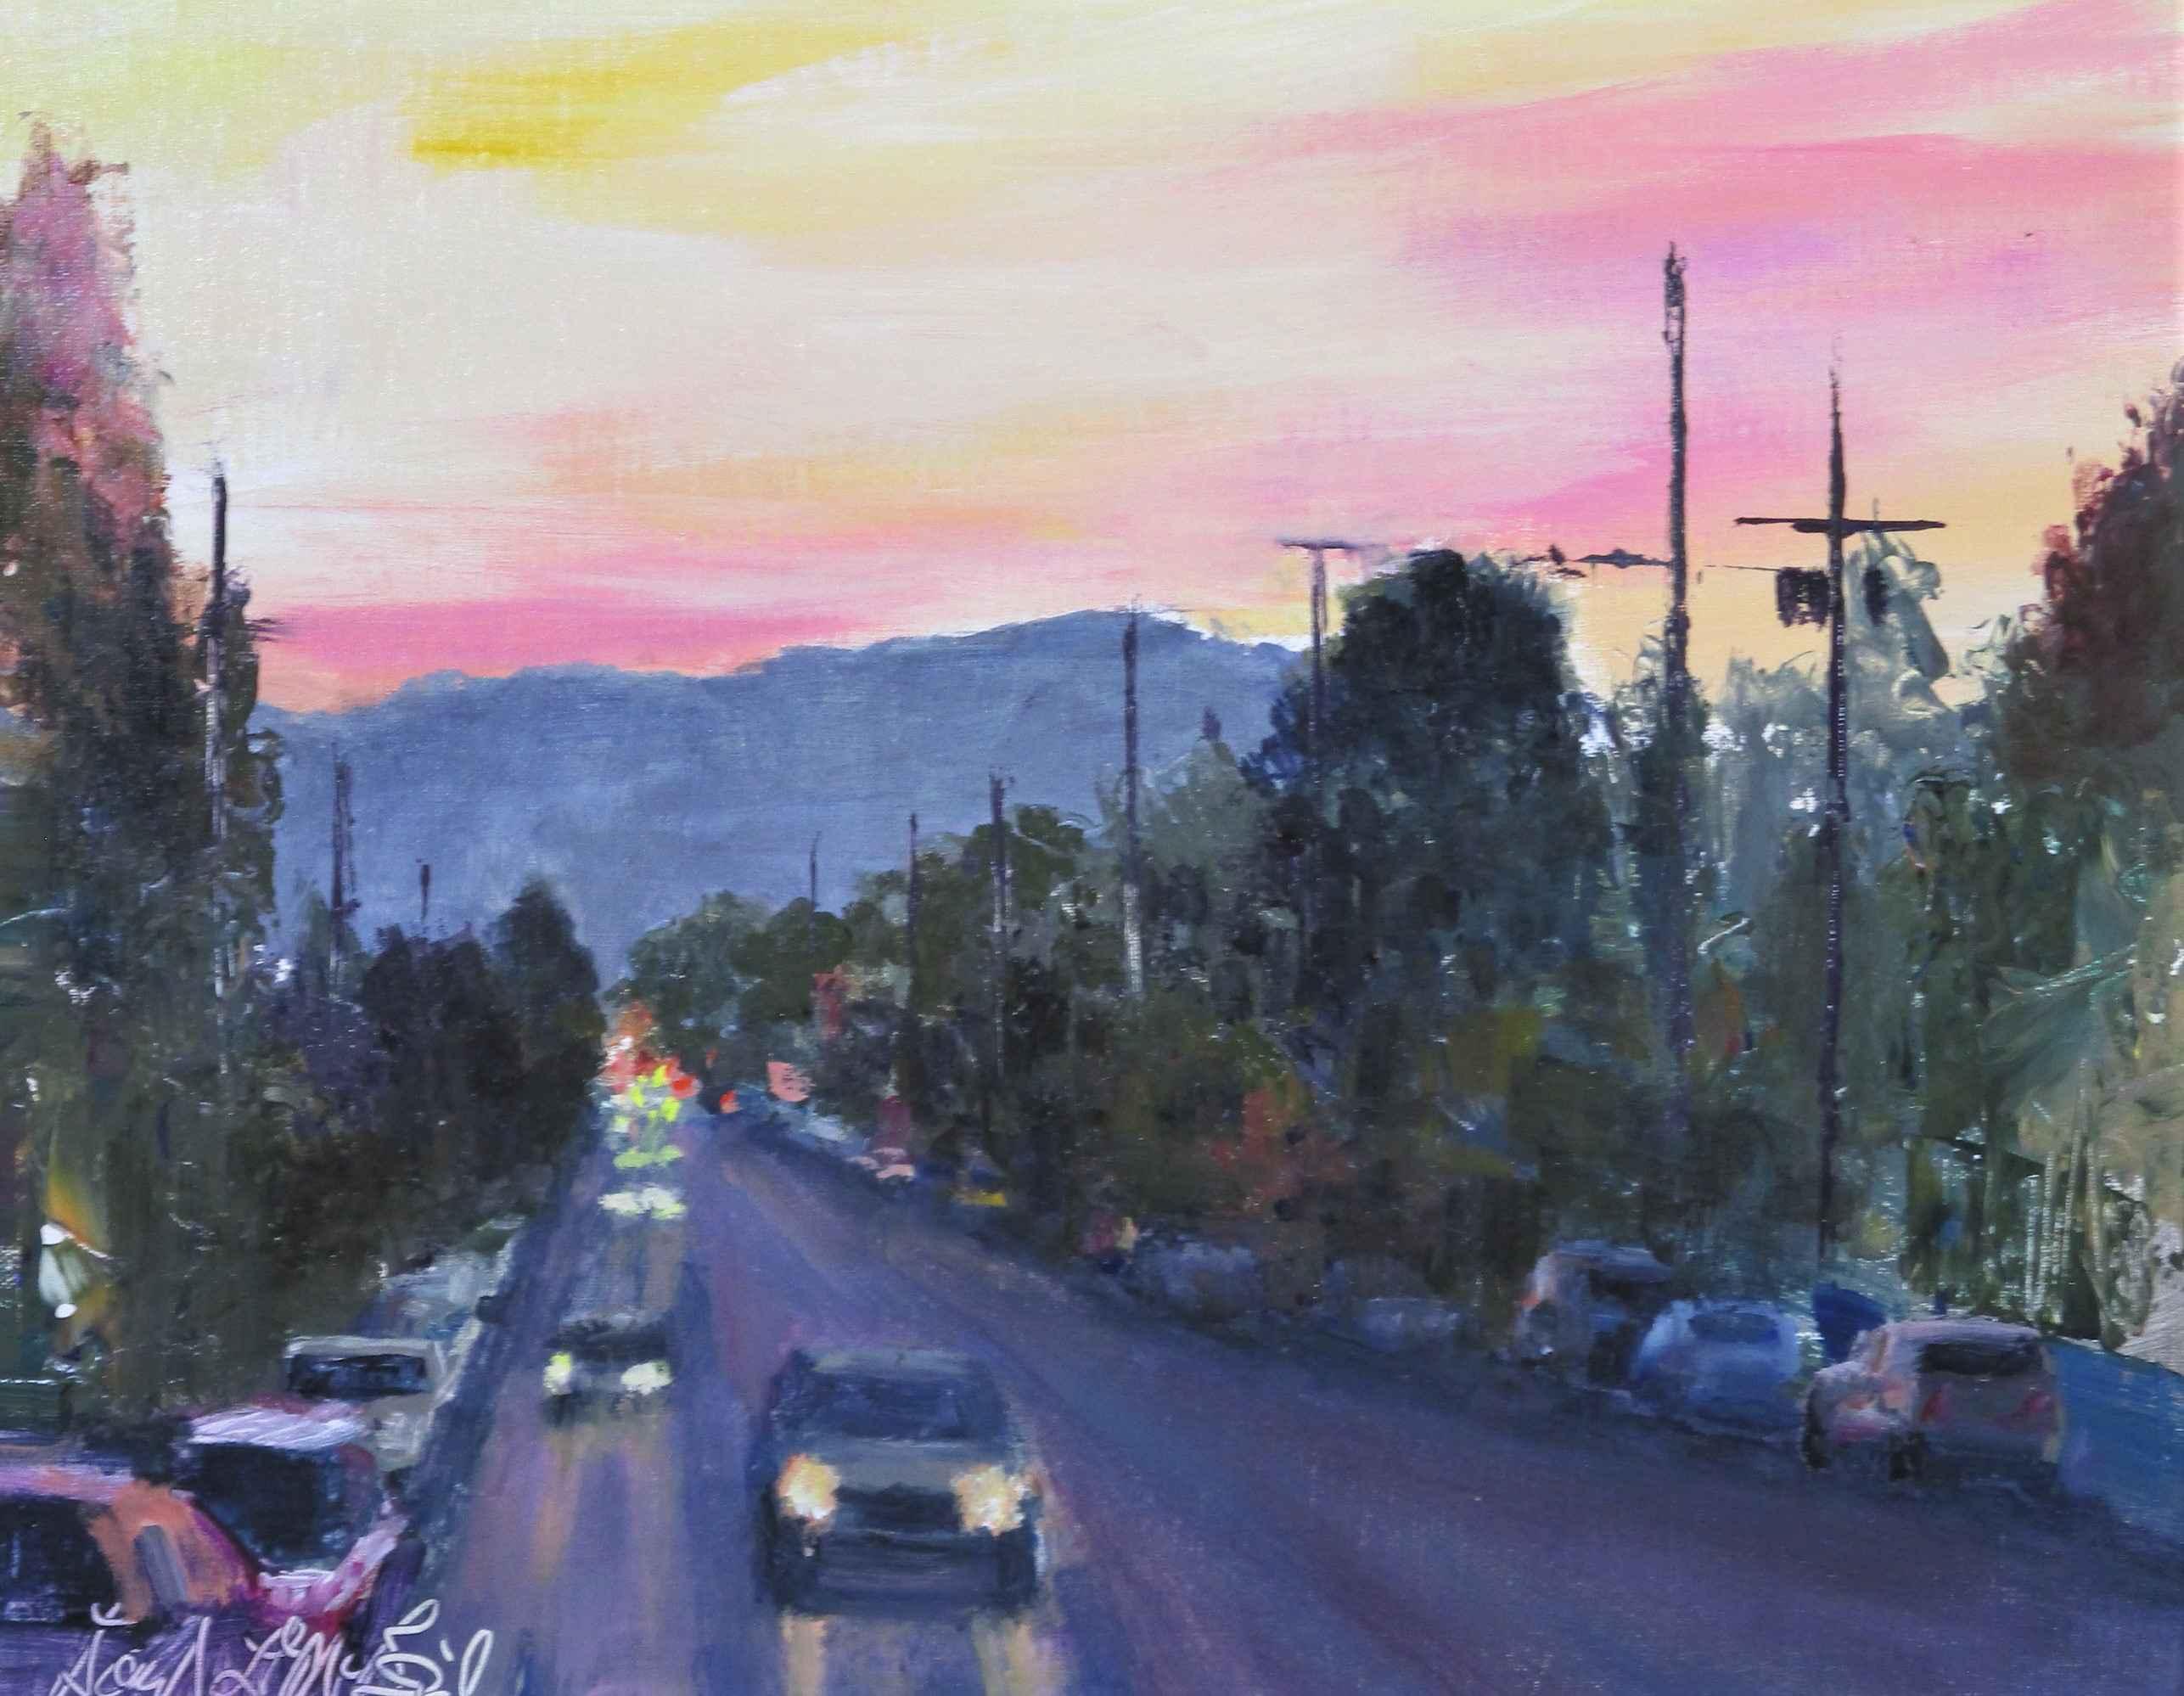 Stumptown at Dusk by  David McBride - Masterpiece Online